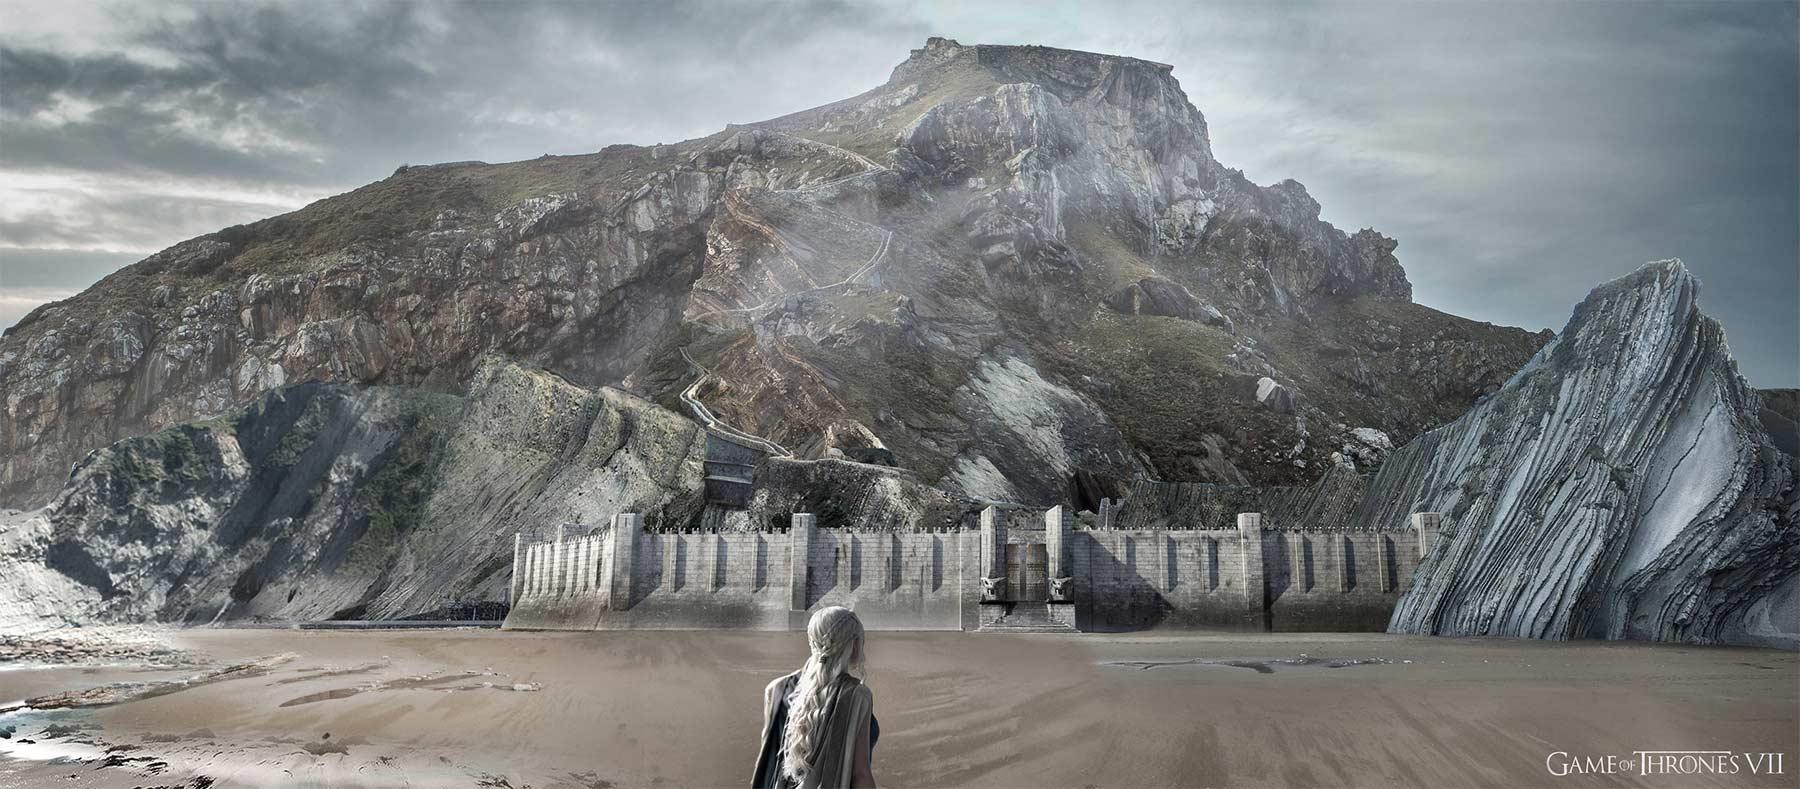 Game of Thrones Staffel 7 Concept Art Kieran-Belshaw-game-of-thrones-concept-art_06